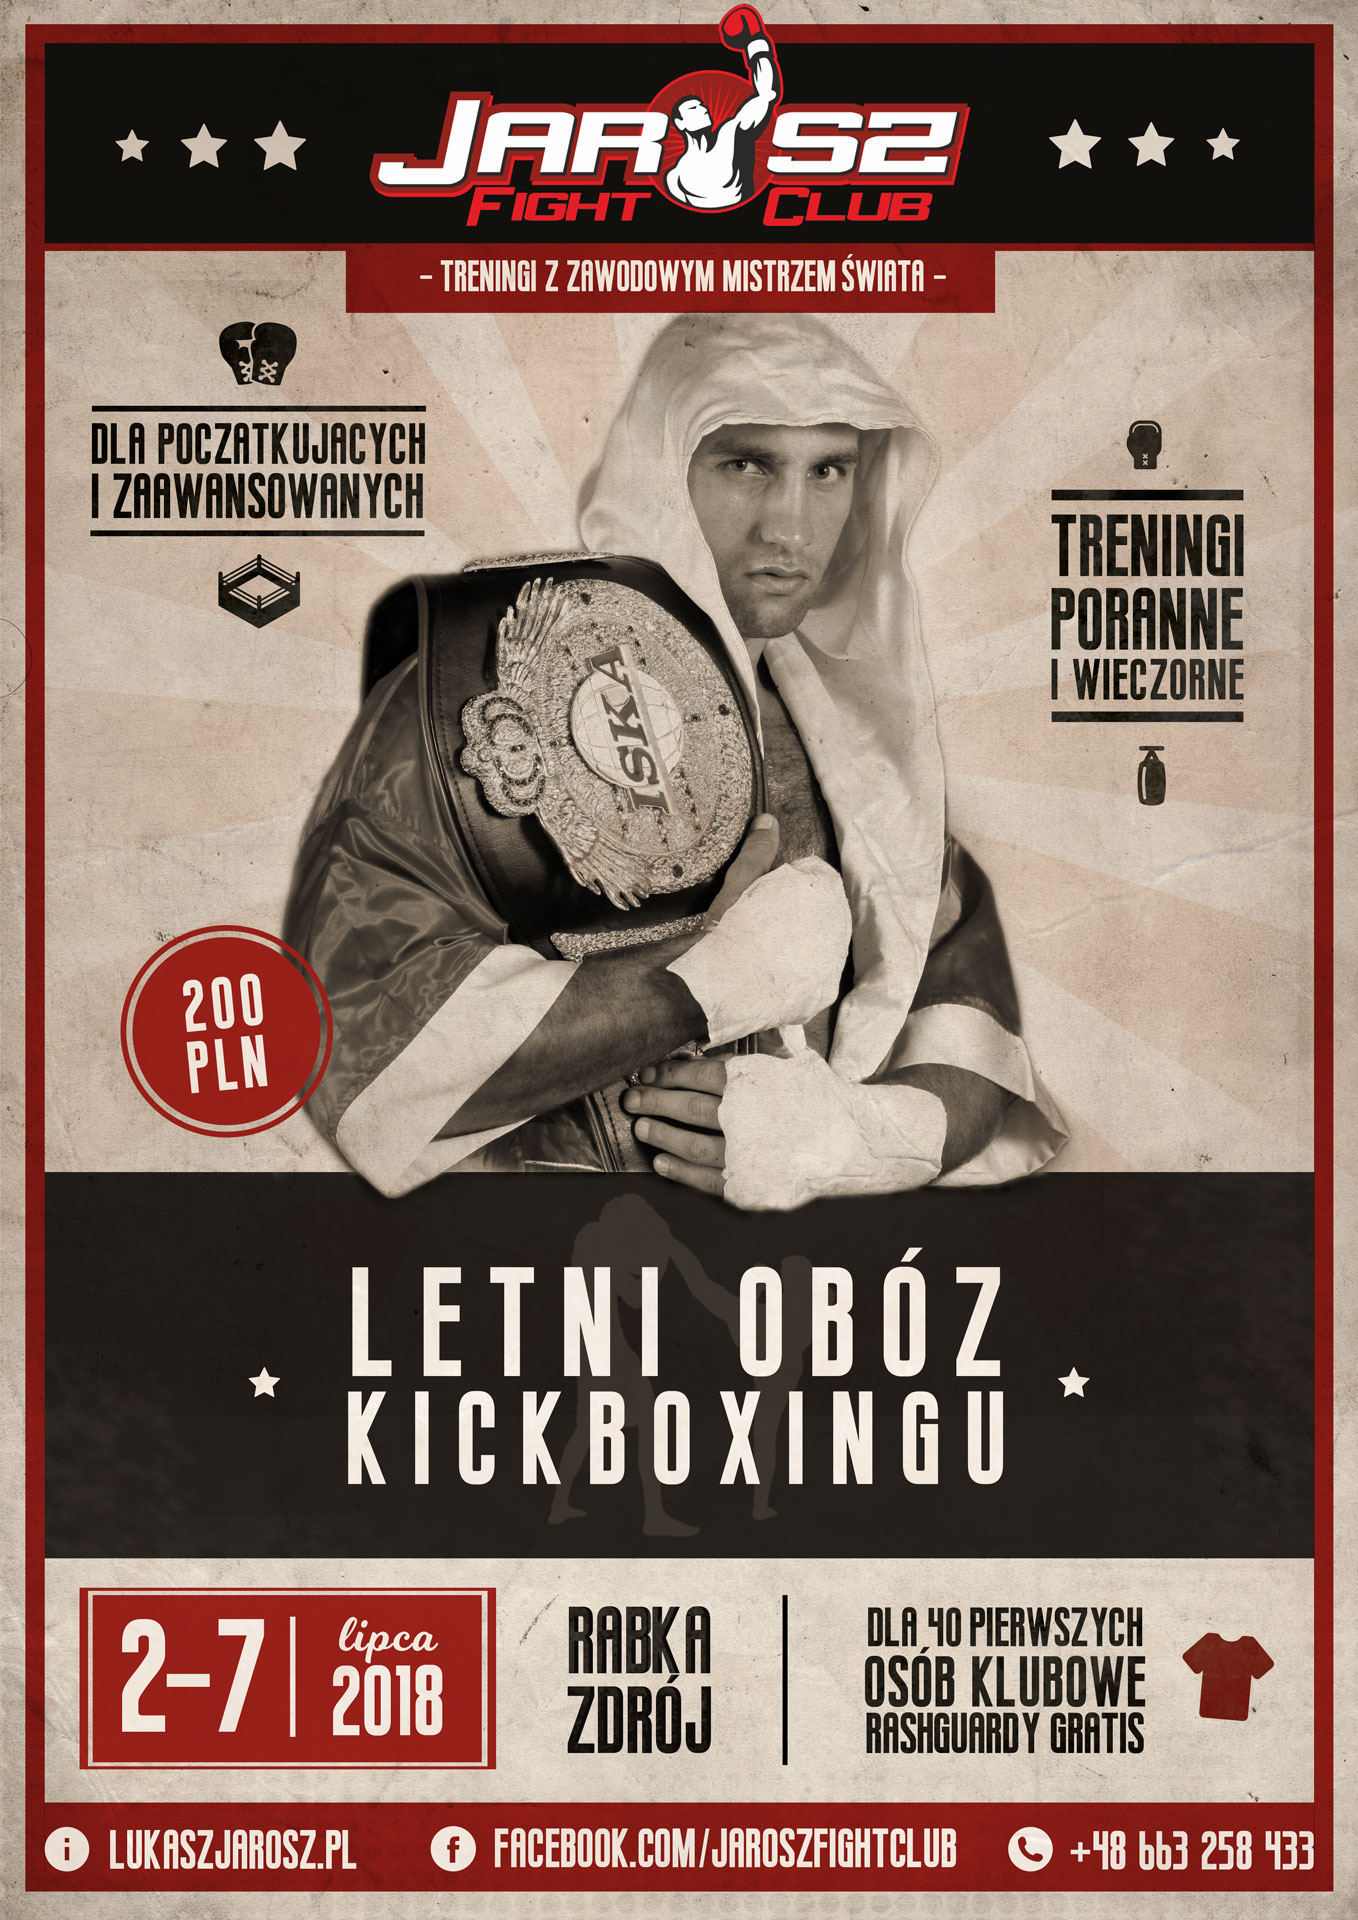 Letni Obóz Kickboxingu 2018